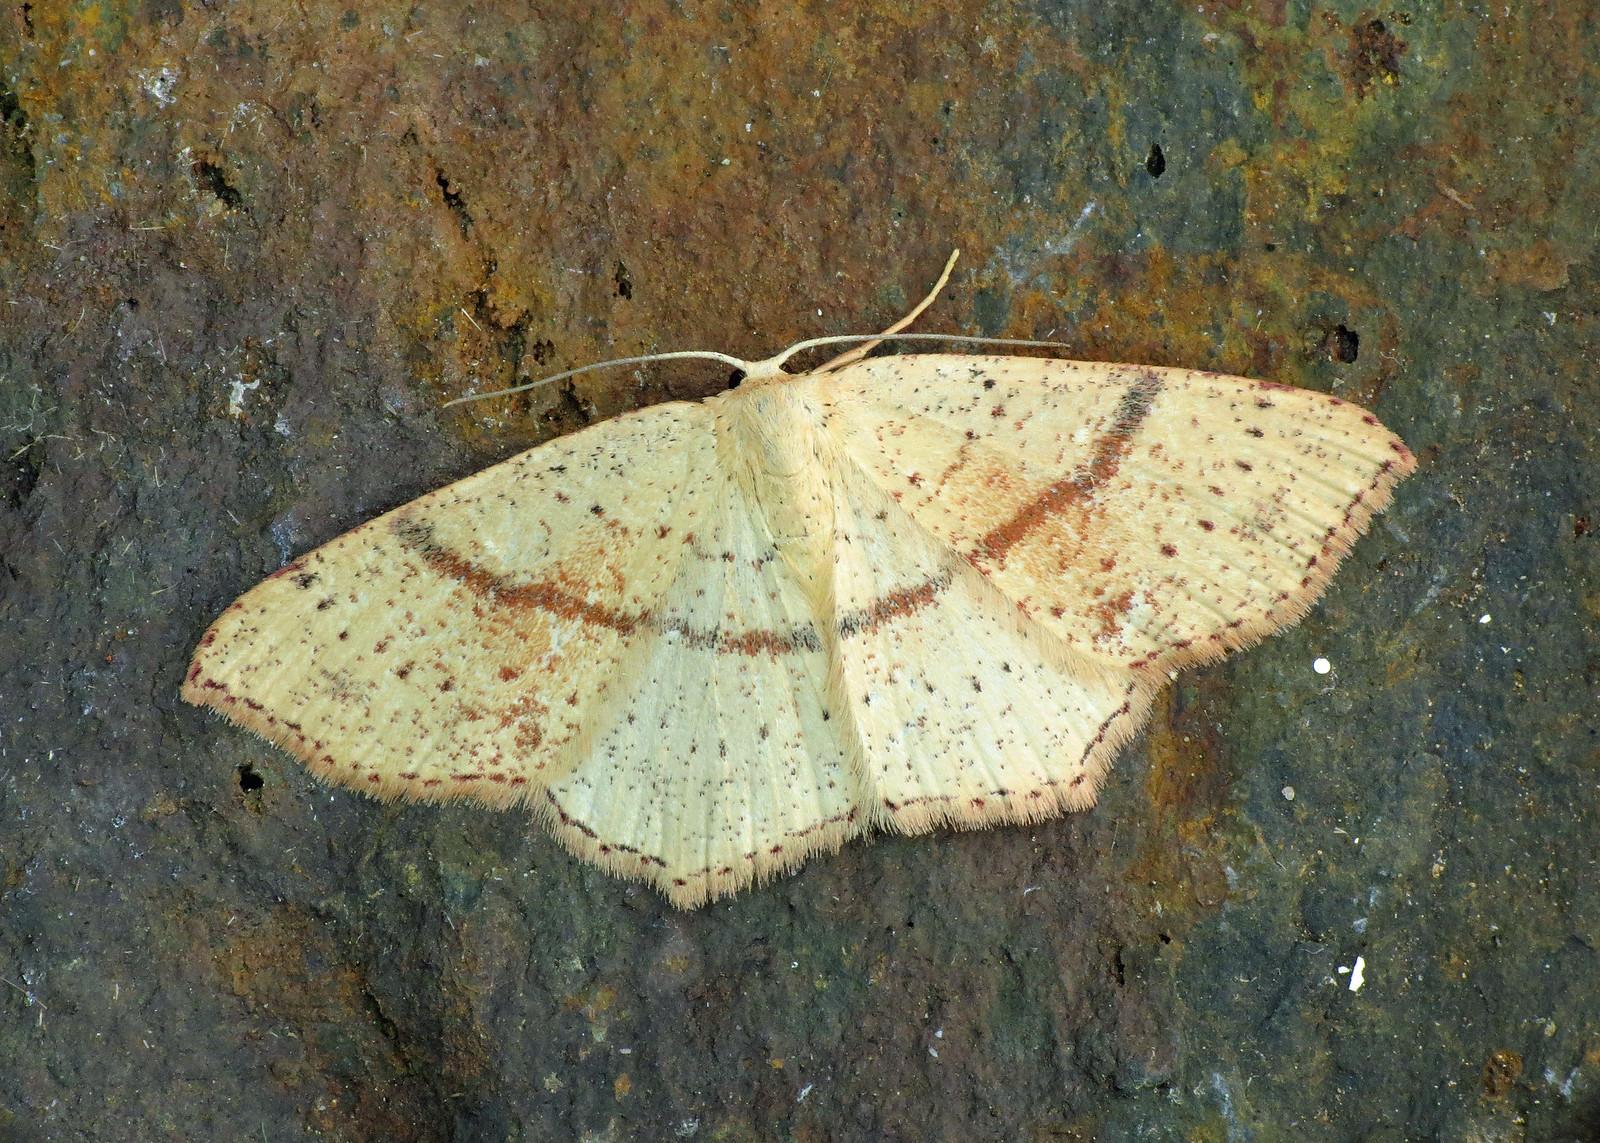 1680 Maiden's Blush - Cyclophora punctaria